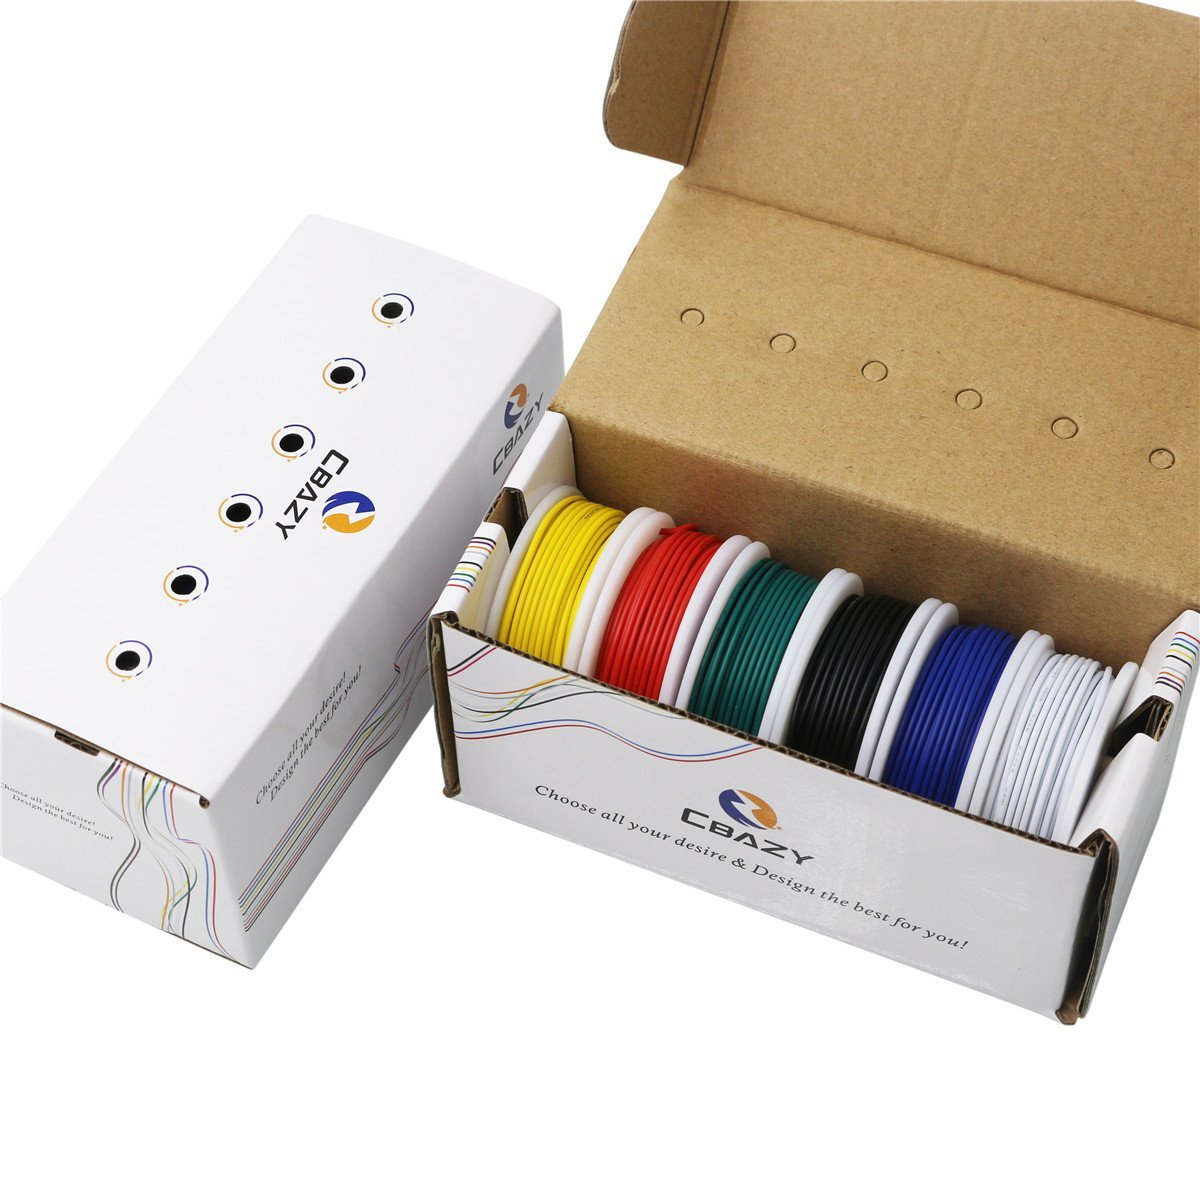 CBAZ Schaltdraht Kit (Litze Kit) 22 Gauge 6 farben 26,2 feet Jede ...